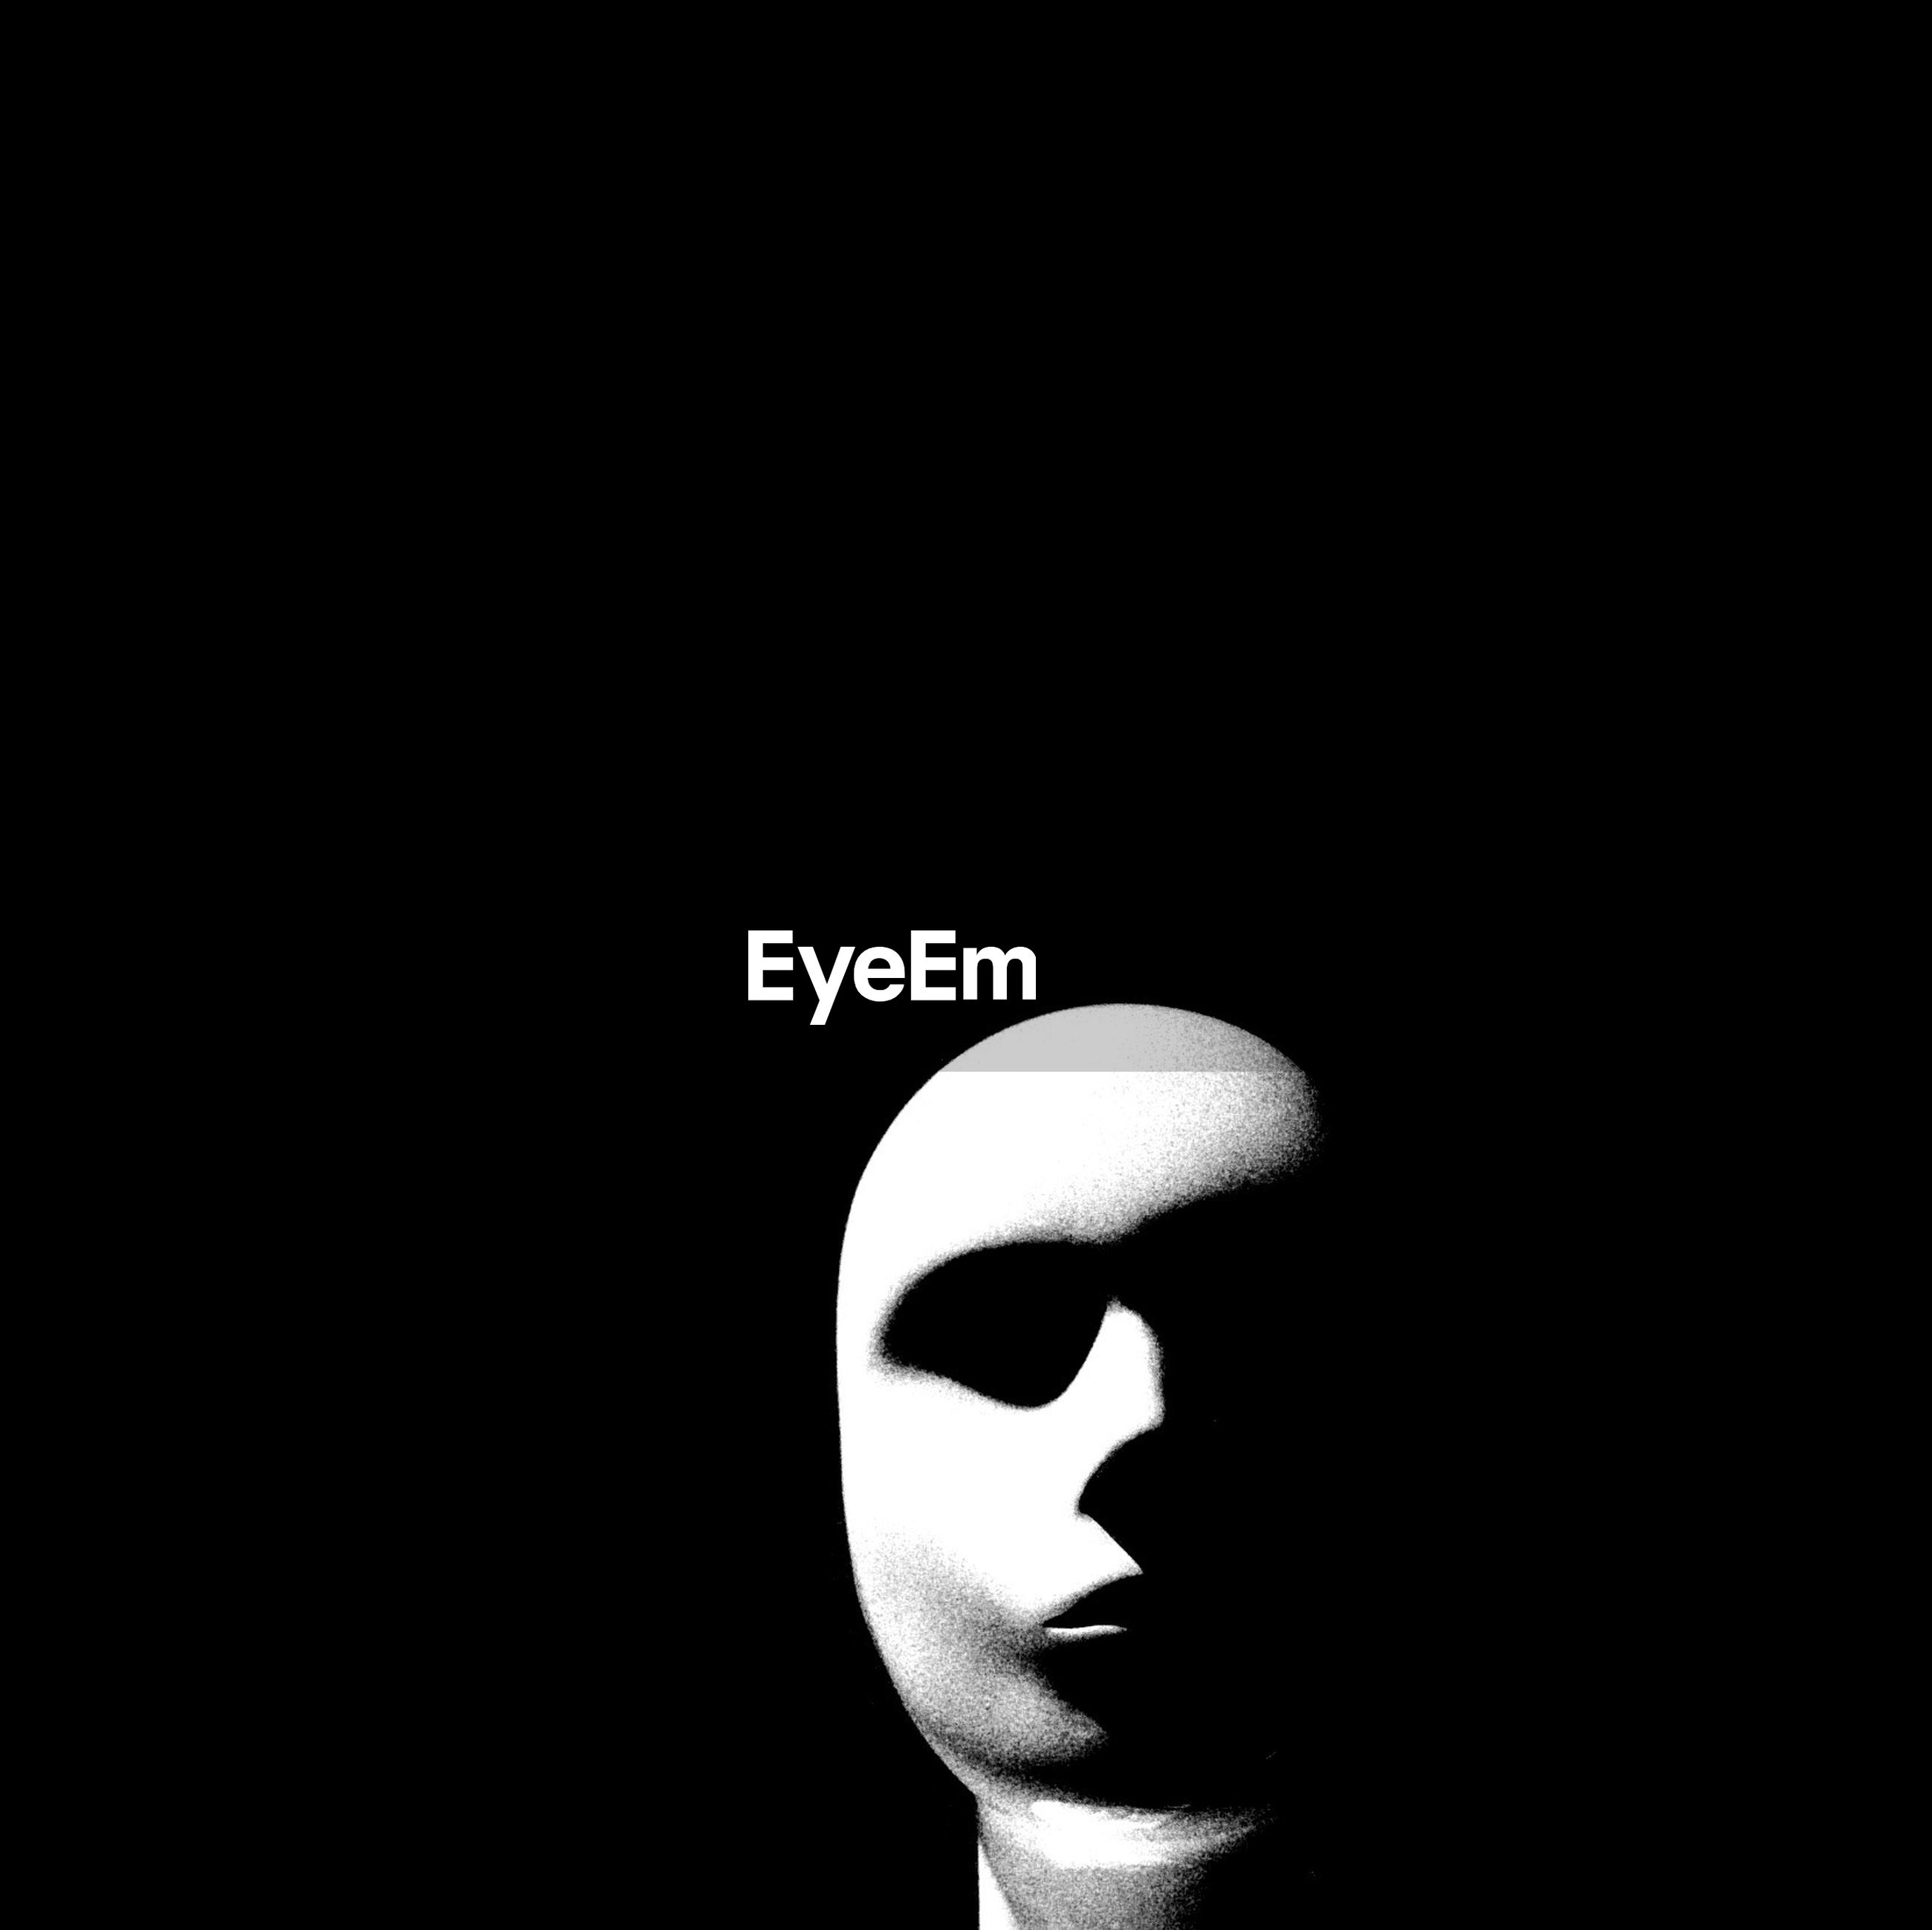 Mannequin head against black background